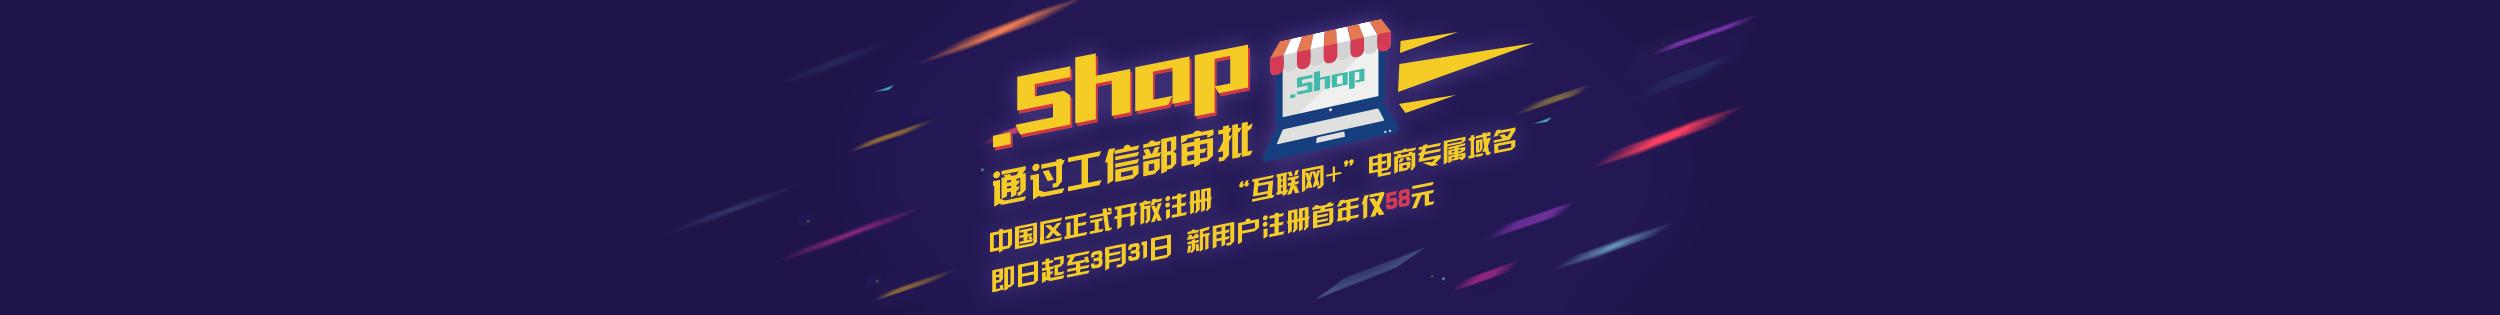 shop域名注册58元首年